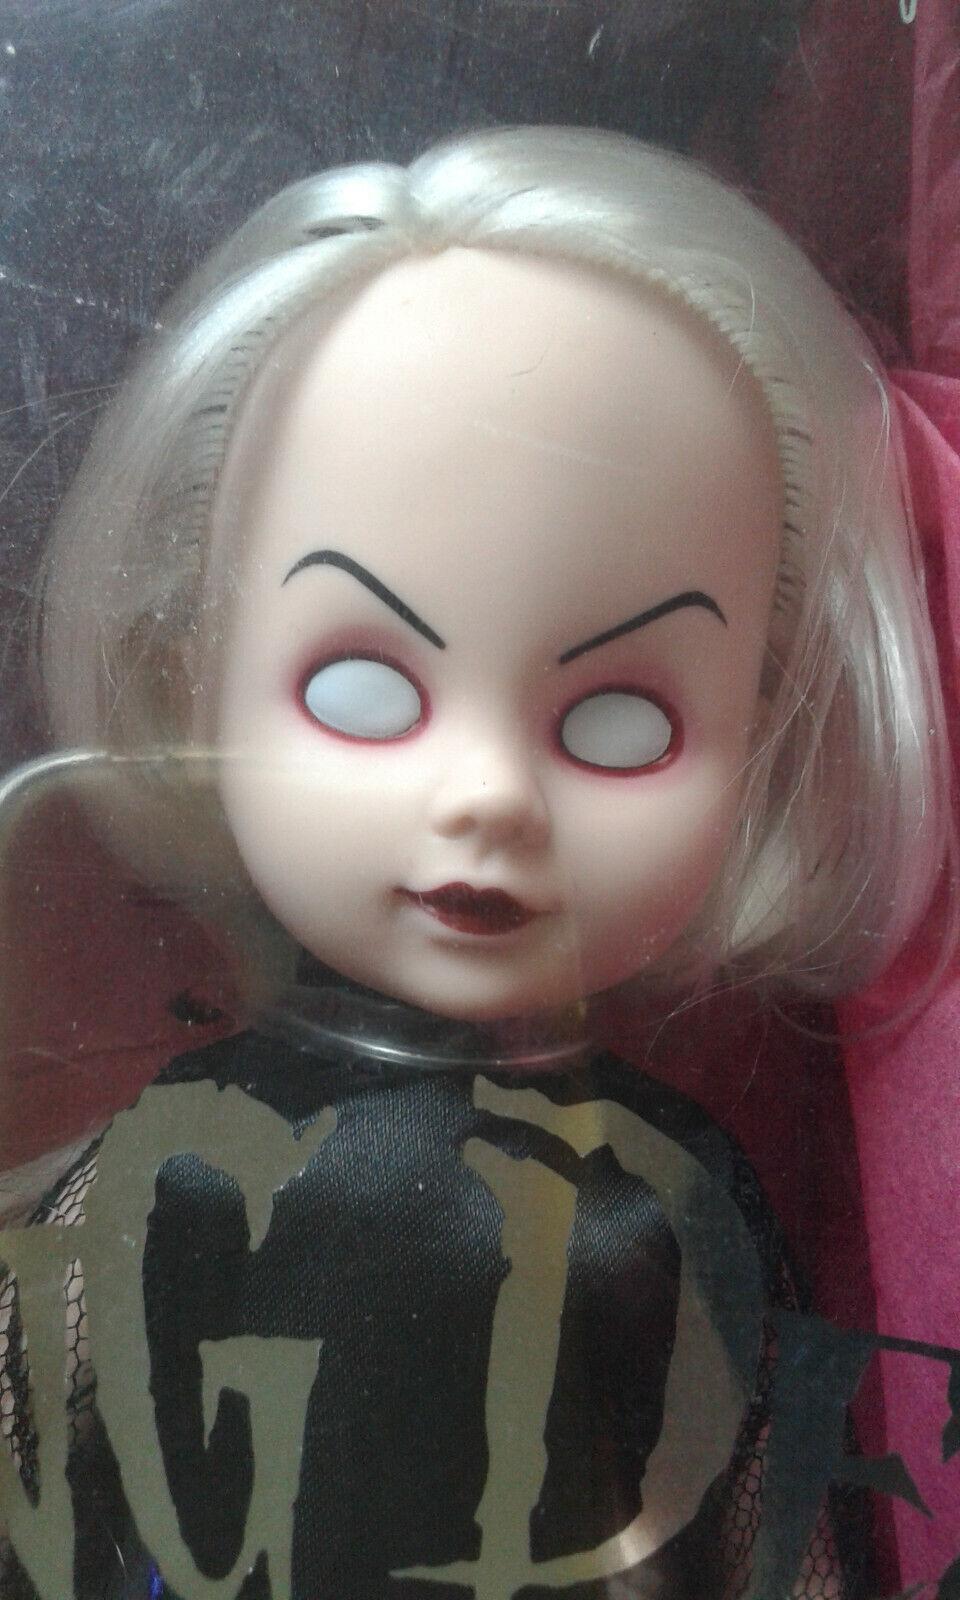 Living Dead Dead Dead Dolls LDD Series 4 Ms. Eerie new&sealed 0c8d32